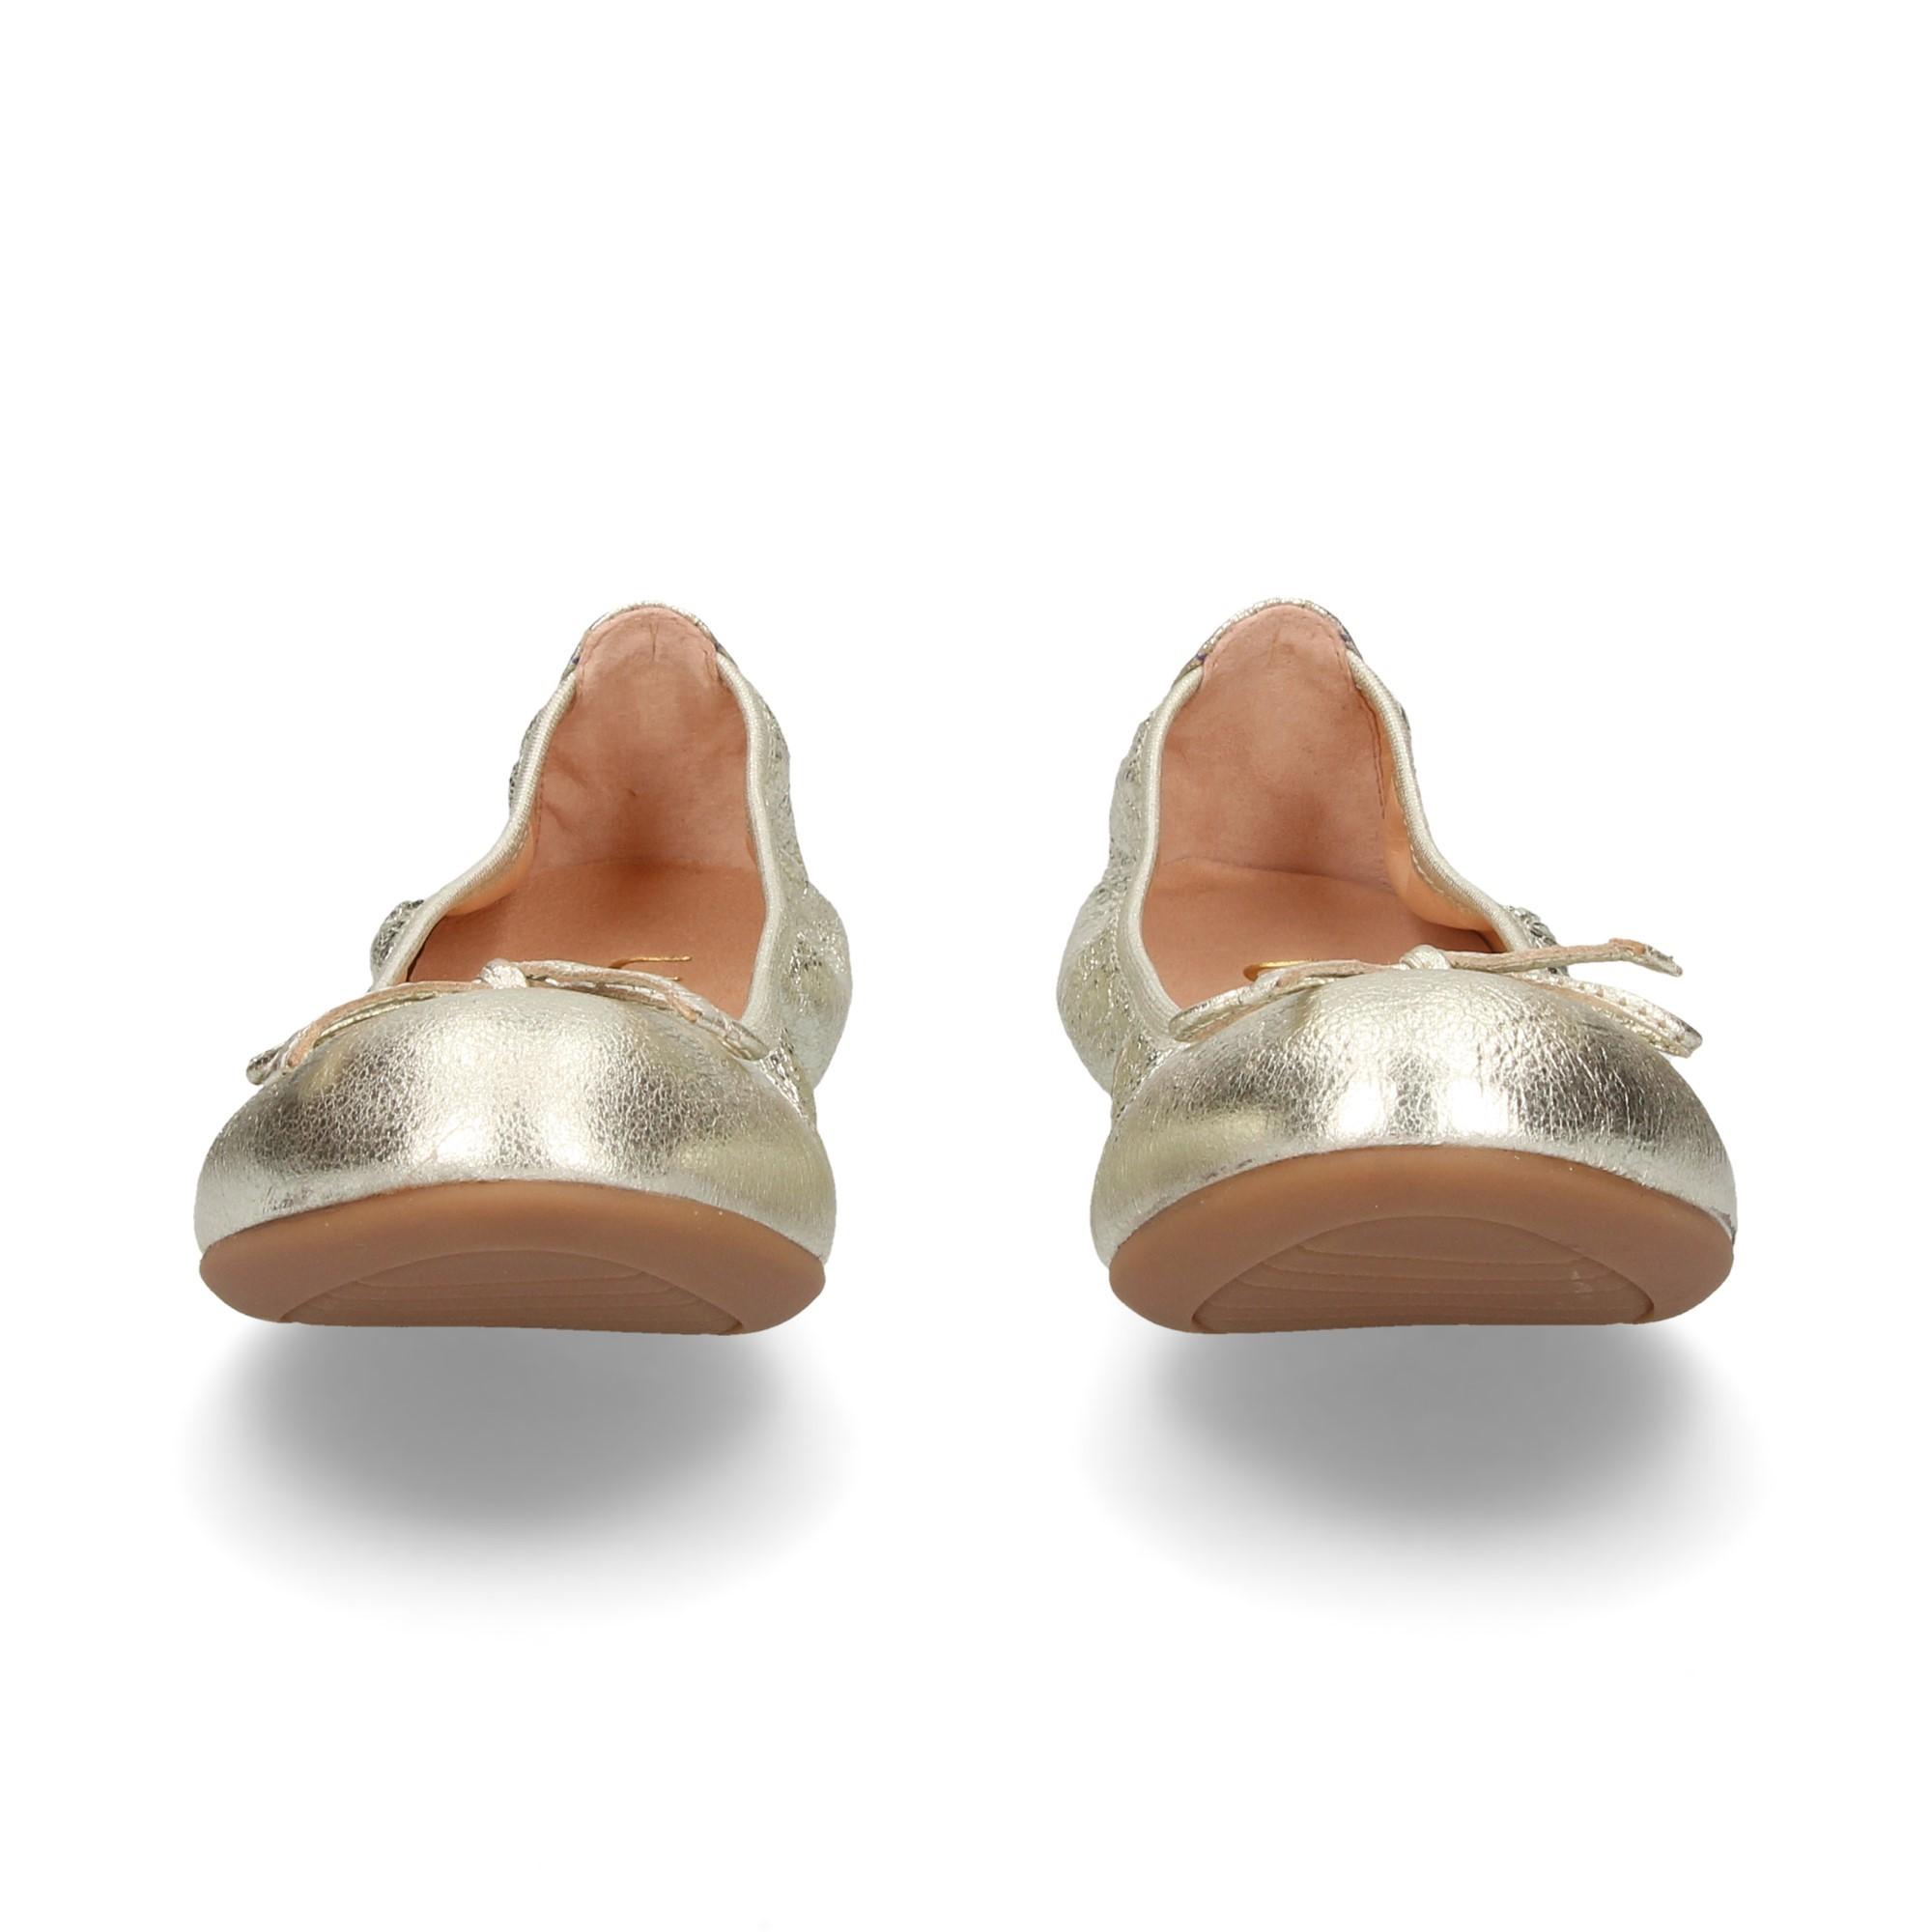 bailarina-lazo-craquelado-platino